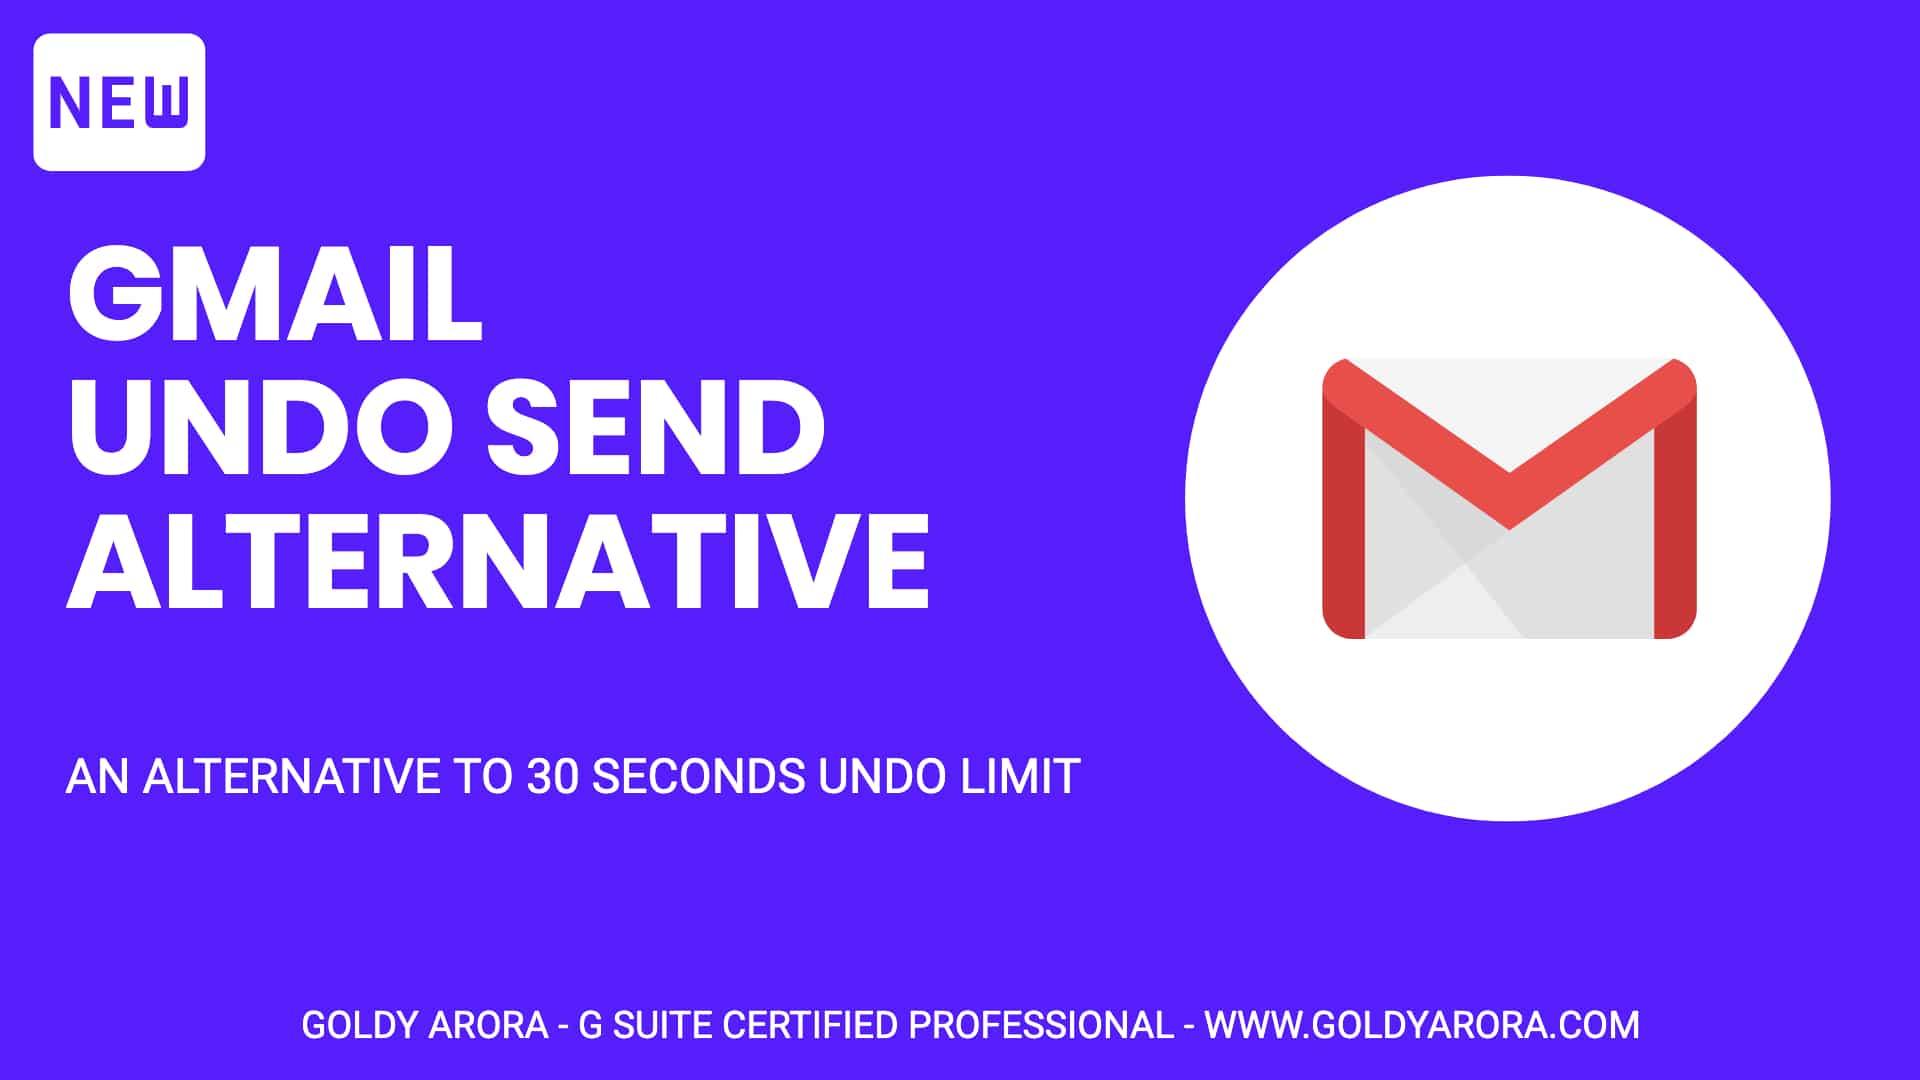 Gmail Undo Send Alternative